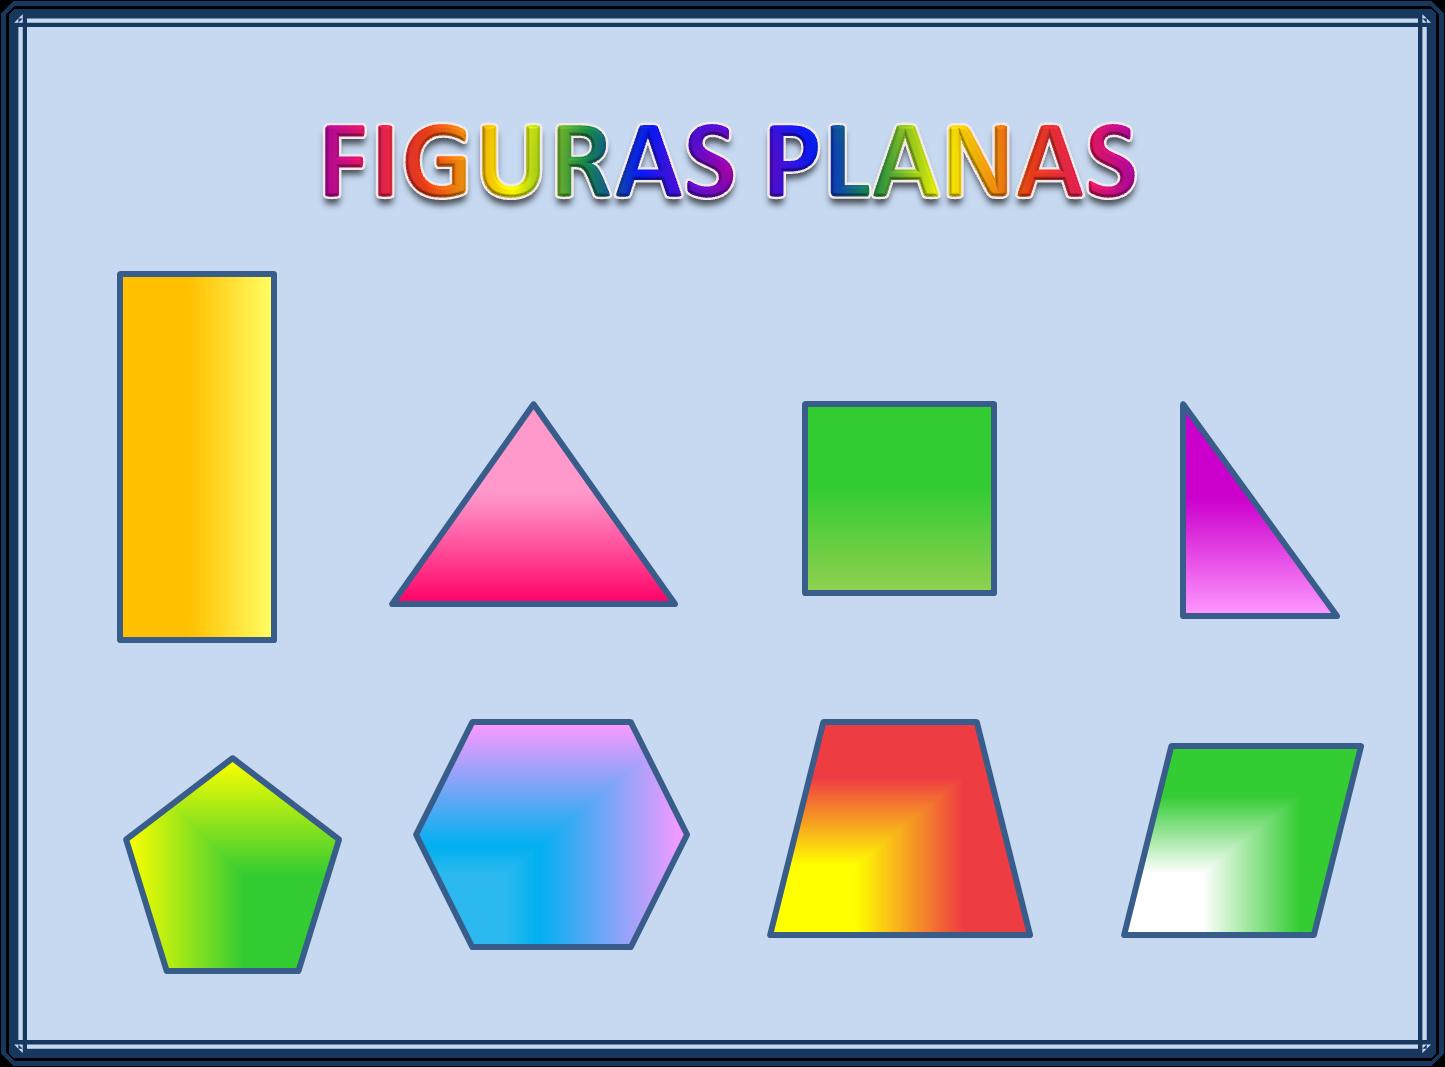 Volamosporprimaria figuras planas for Las formas geometricas